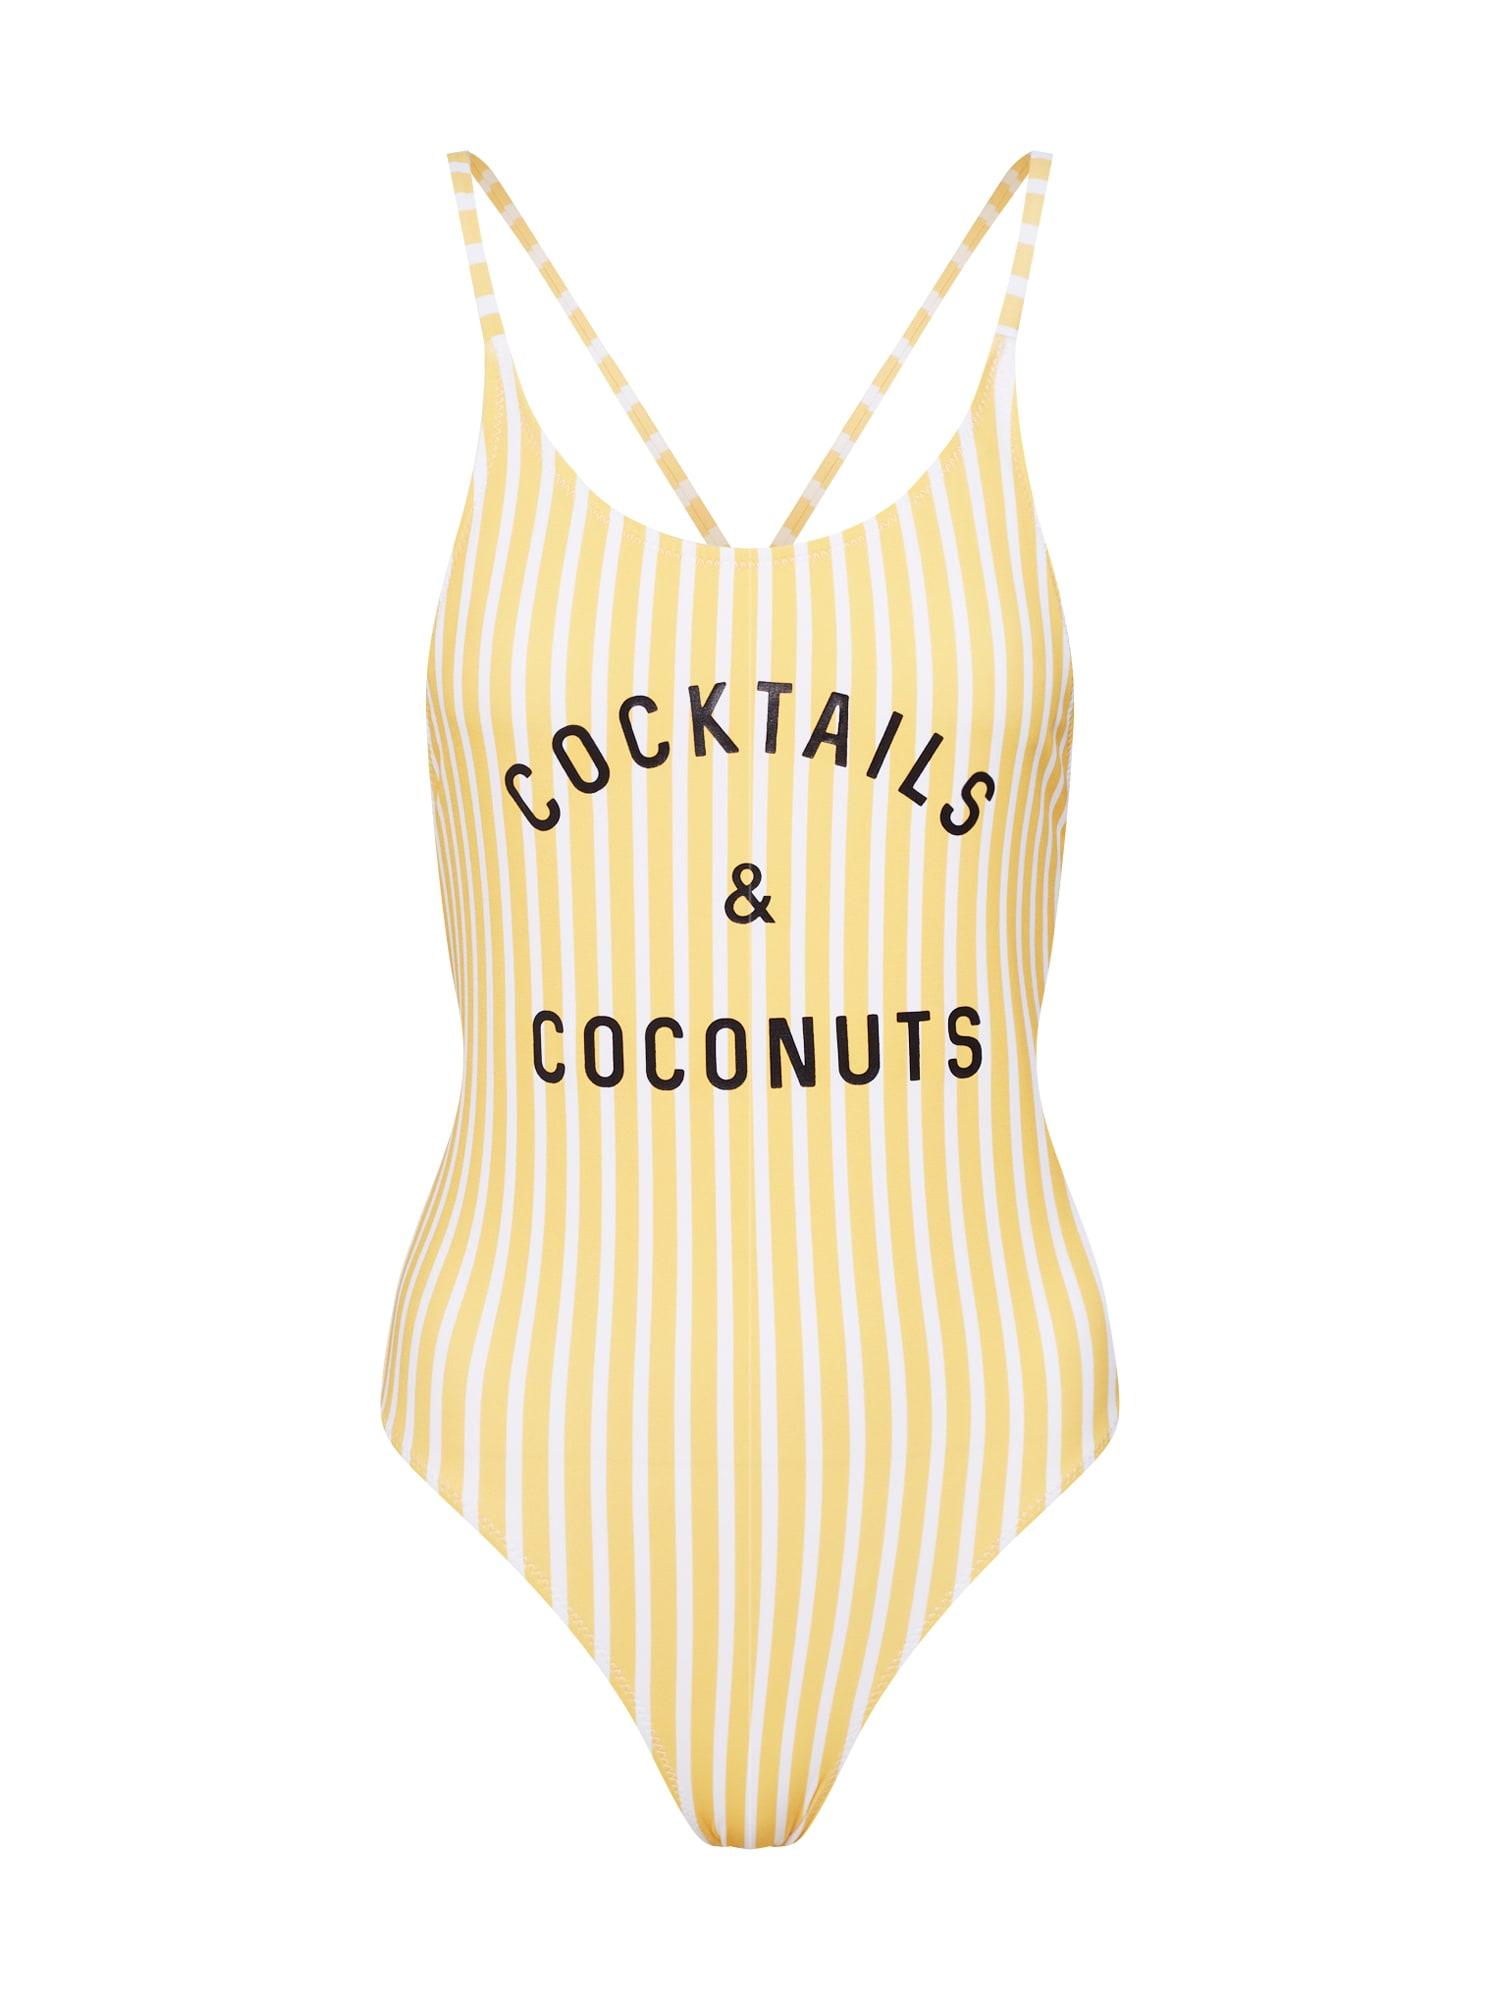 Plavky COCONUTS ONE PIECE  žlutá černá bílá CATWALK JUNKIE